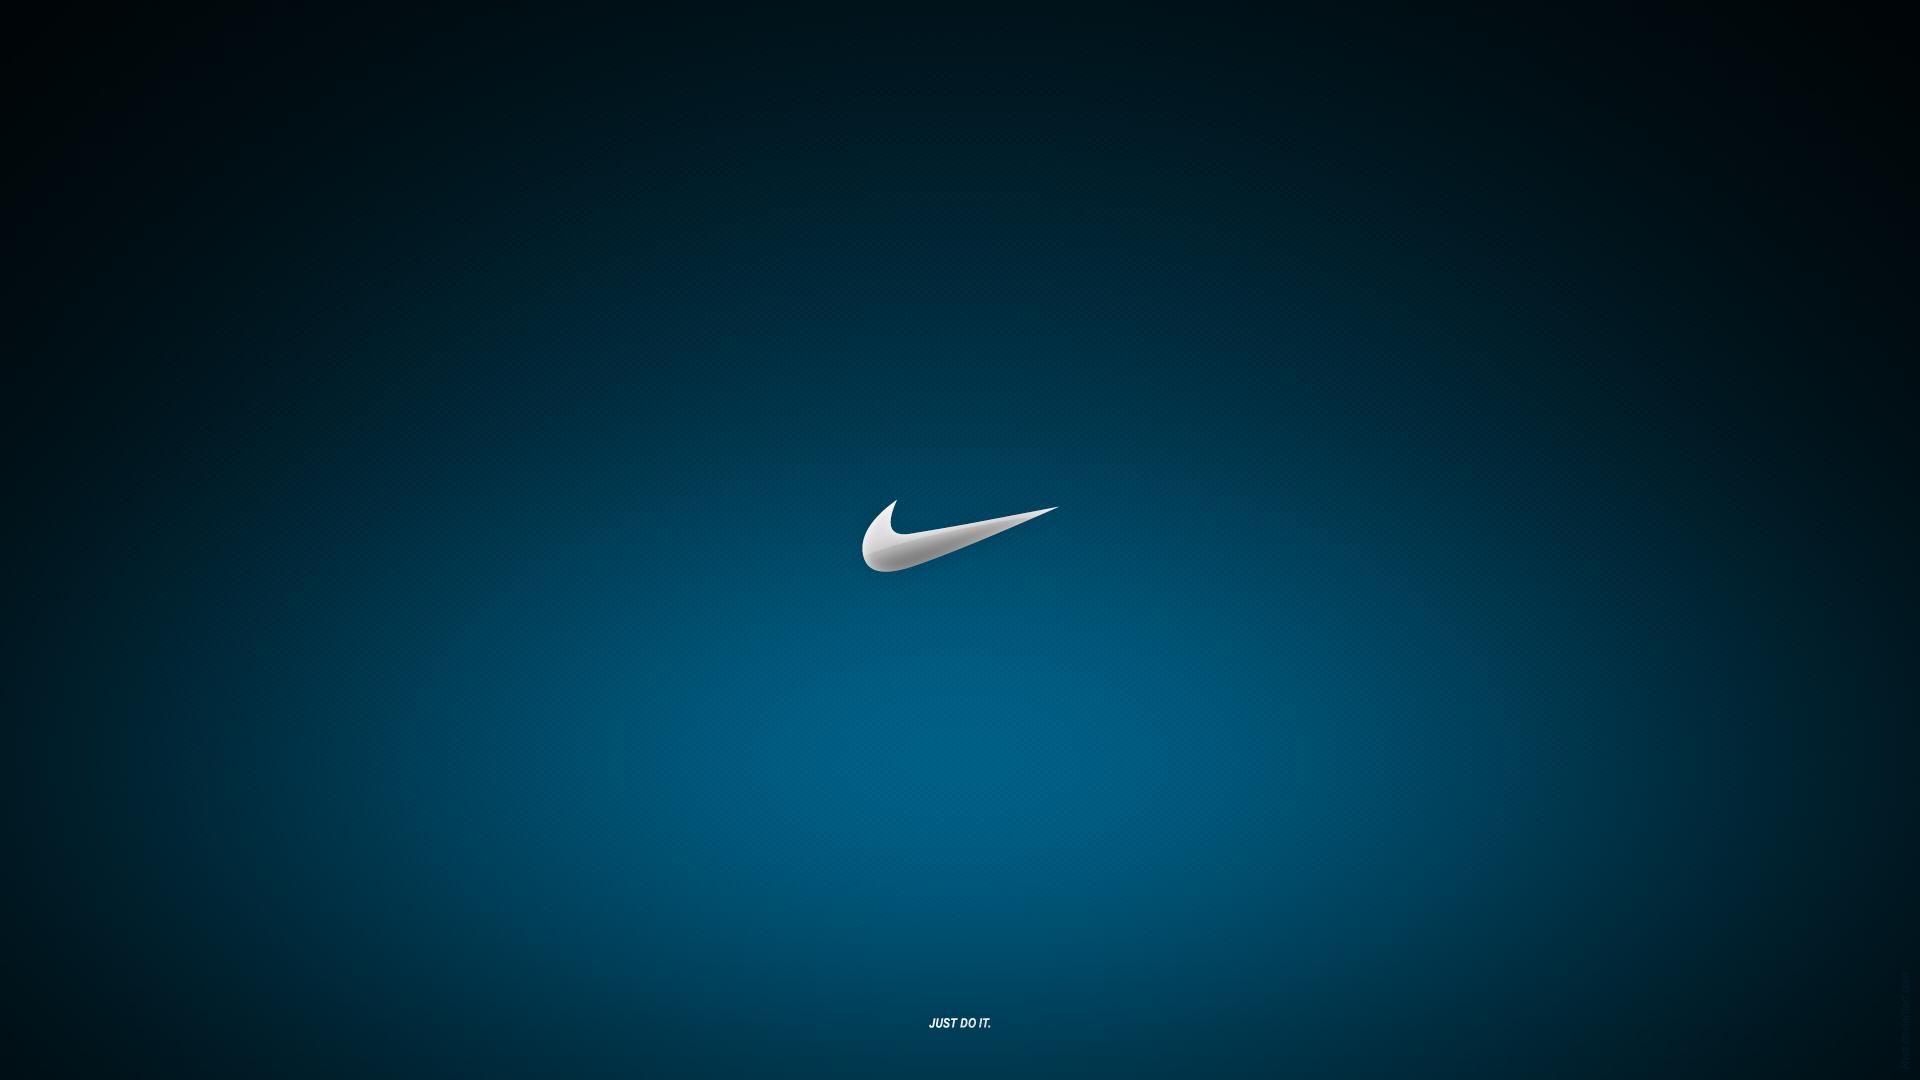 Nike Wallpaper HD 1080p ImageBankbiz 1920x1080